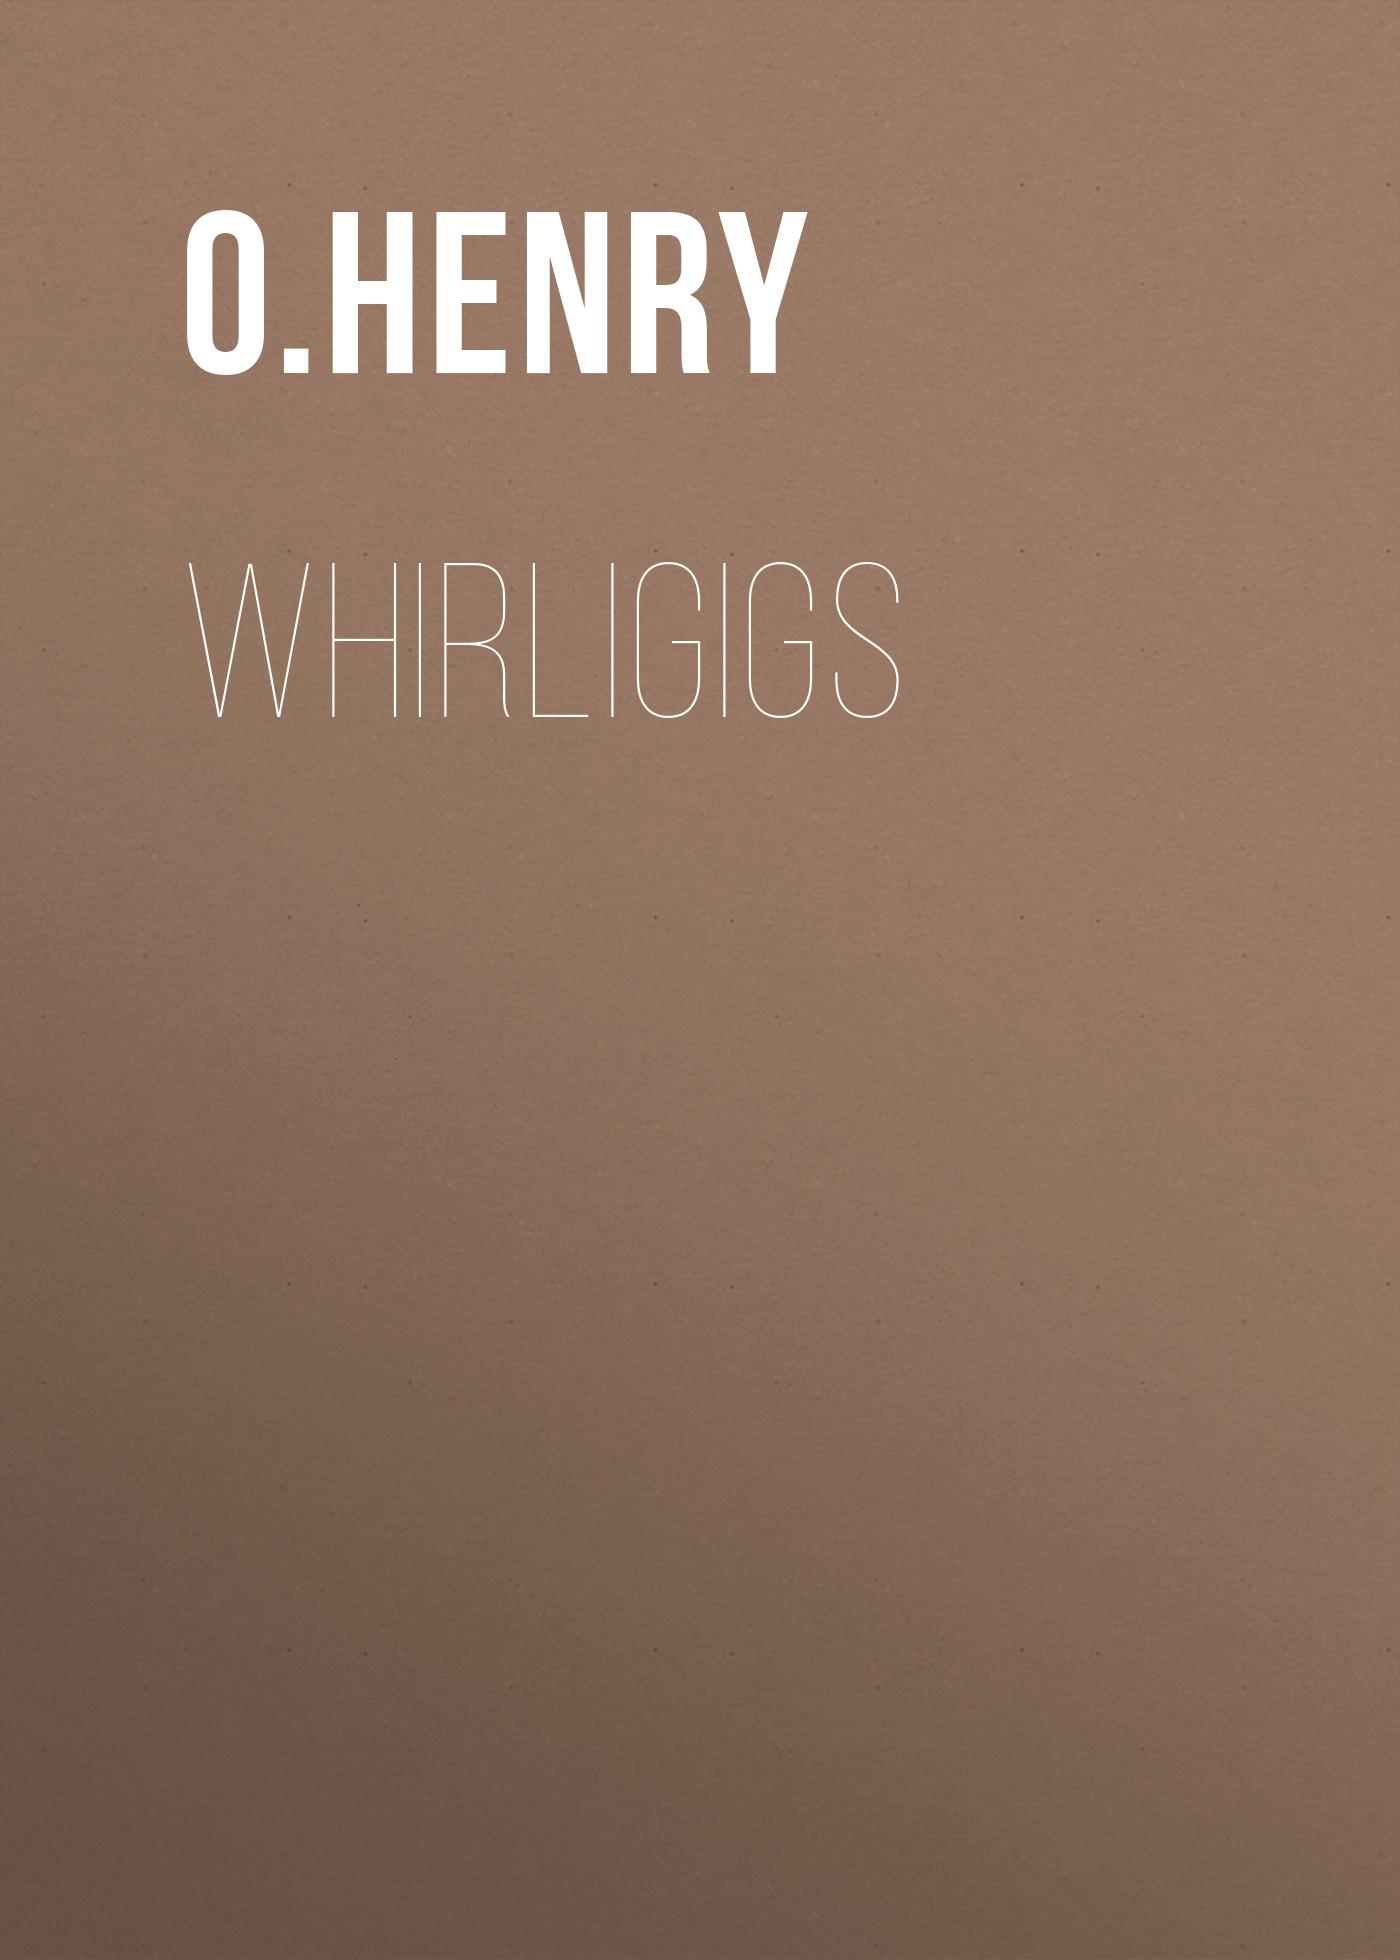 Whirligigs